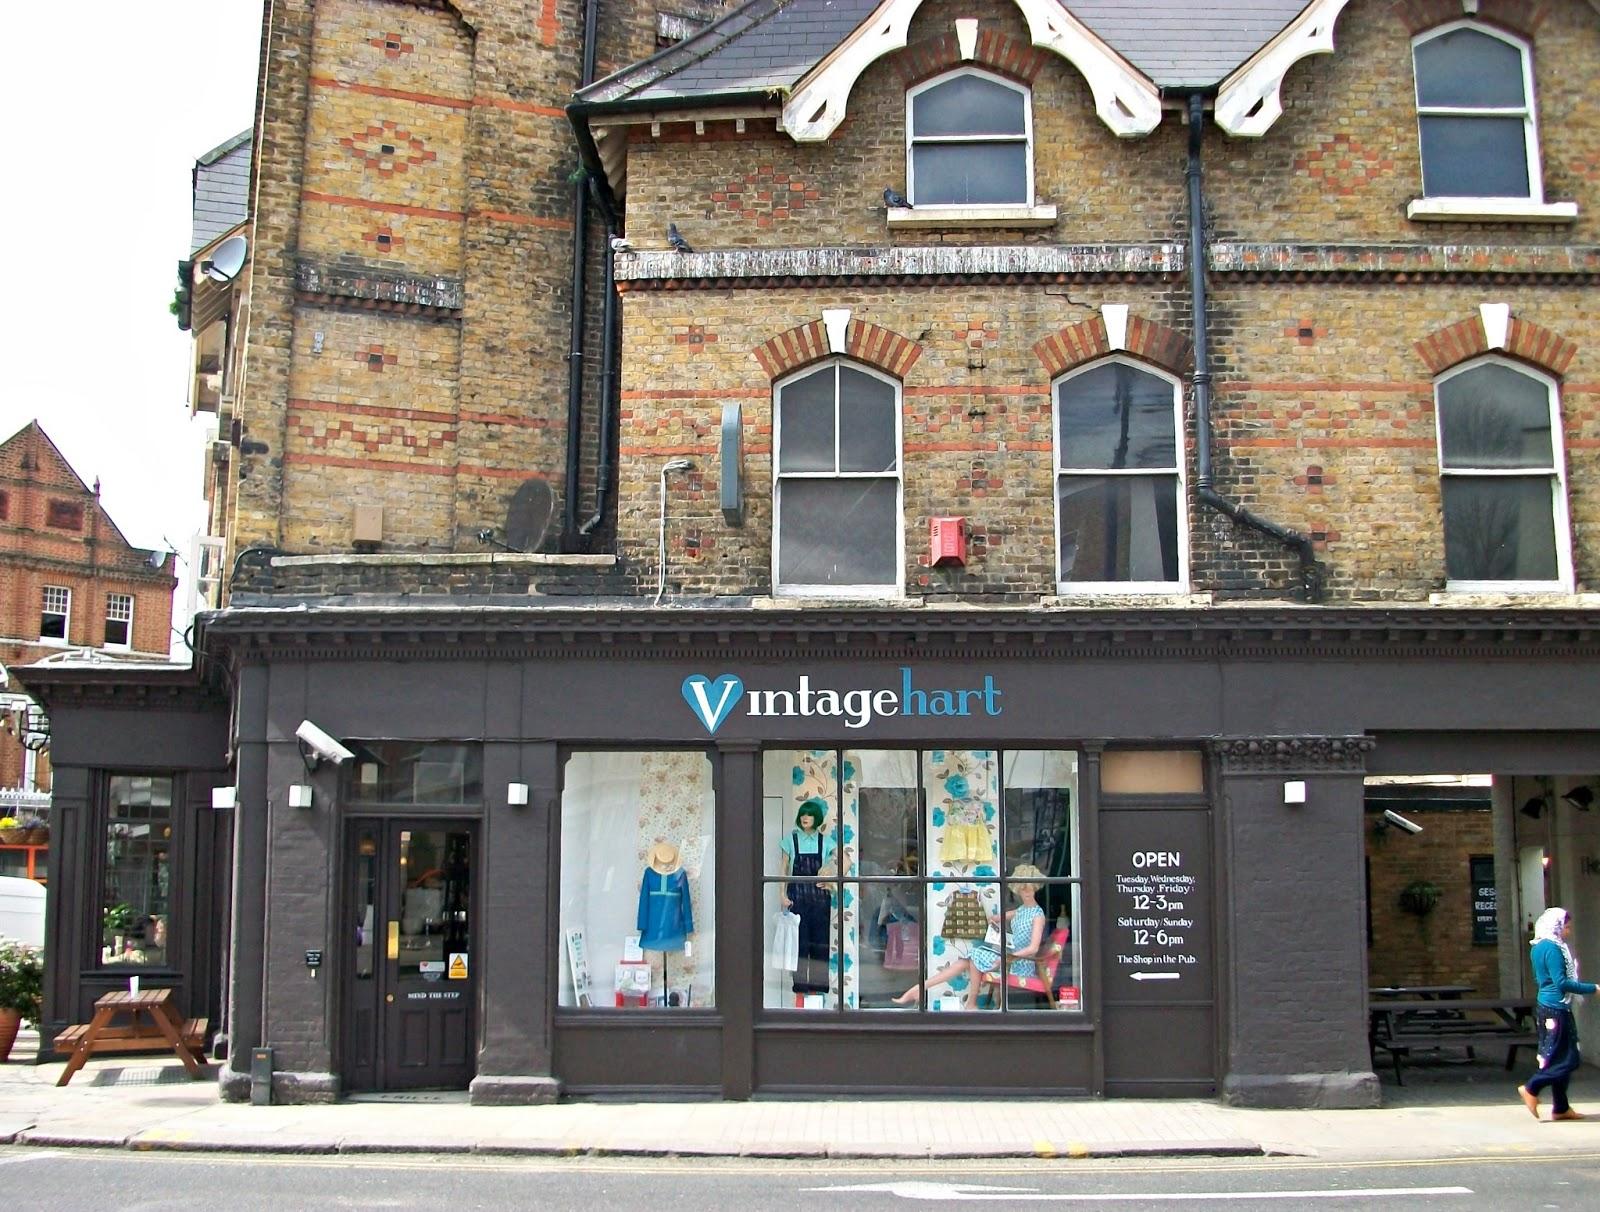 Last-Year Shops: Vintage Hart, Crystal Palace | Last-Year Girl: Last